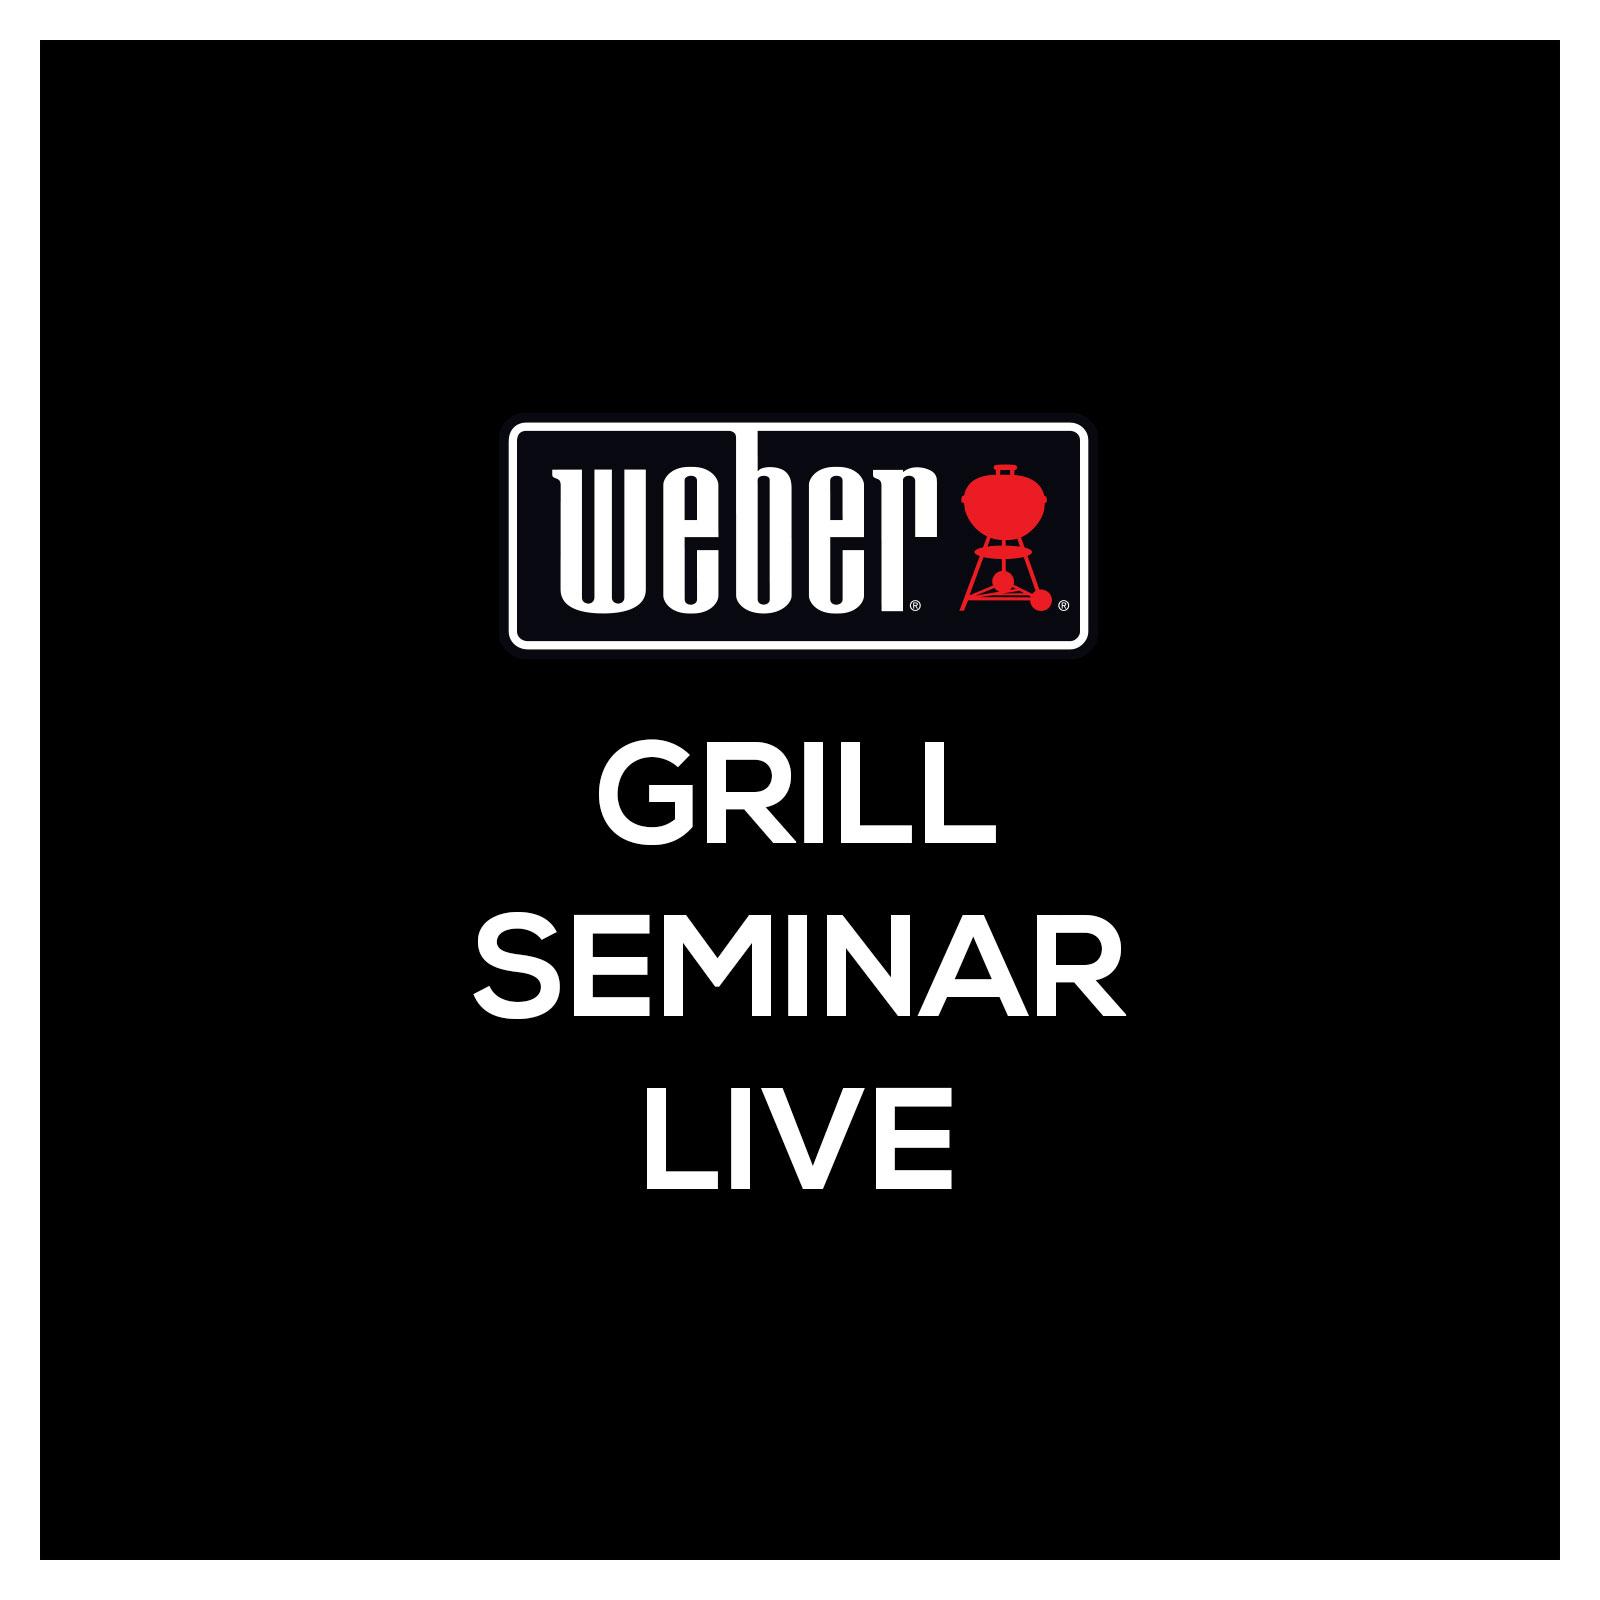 grillakademie saar weber live grillkurs